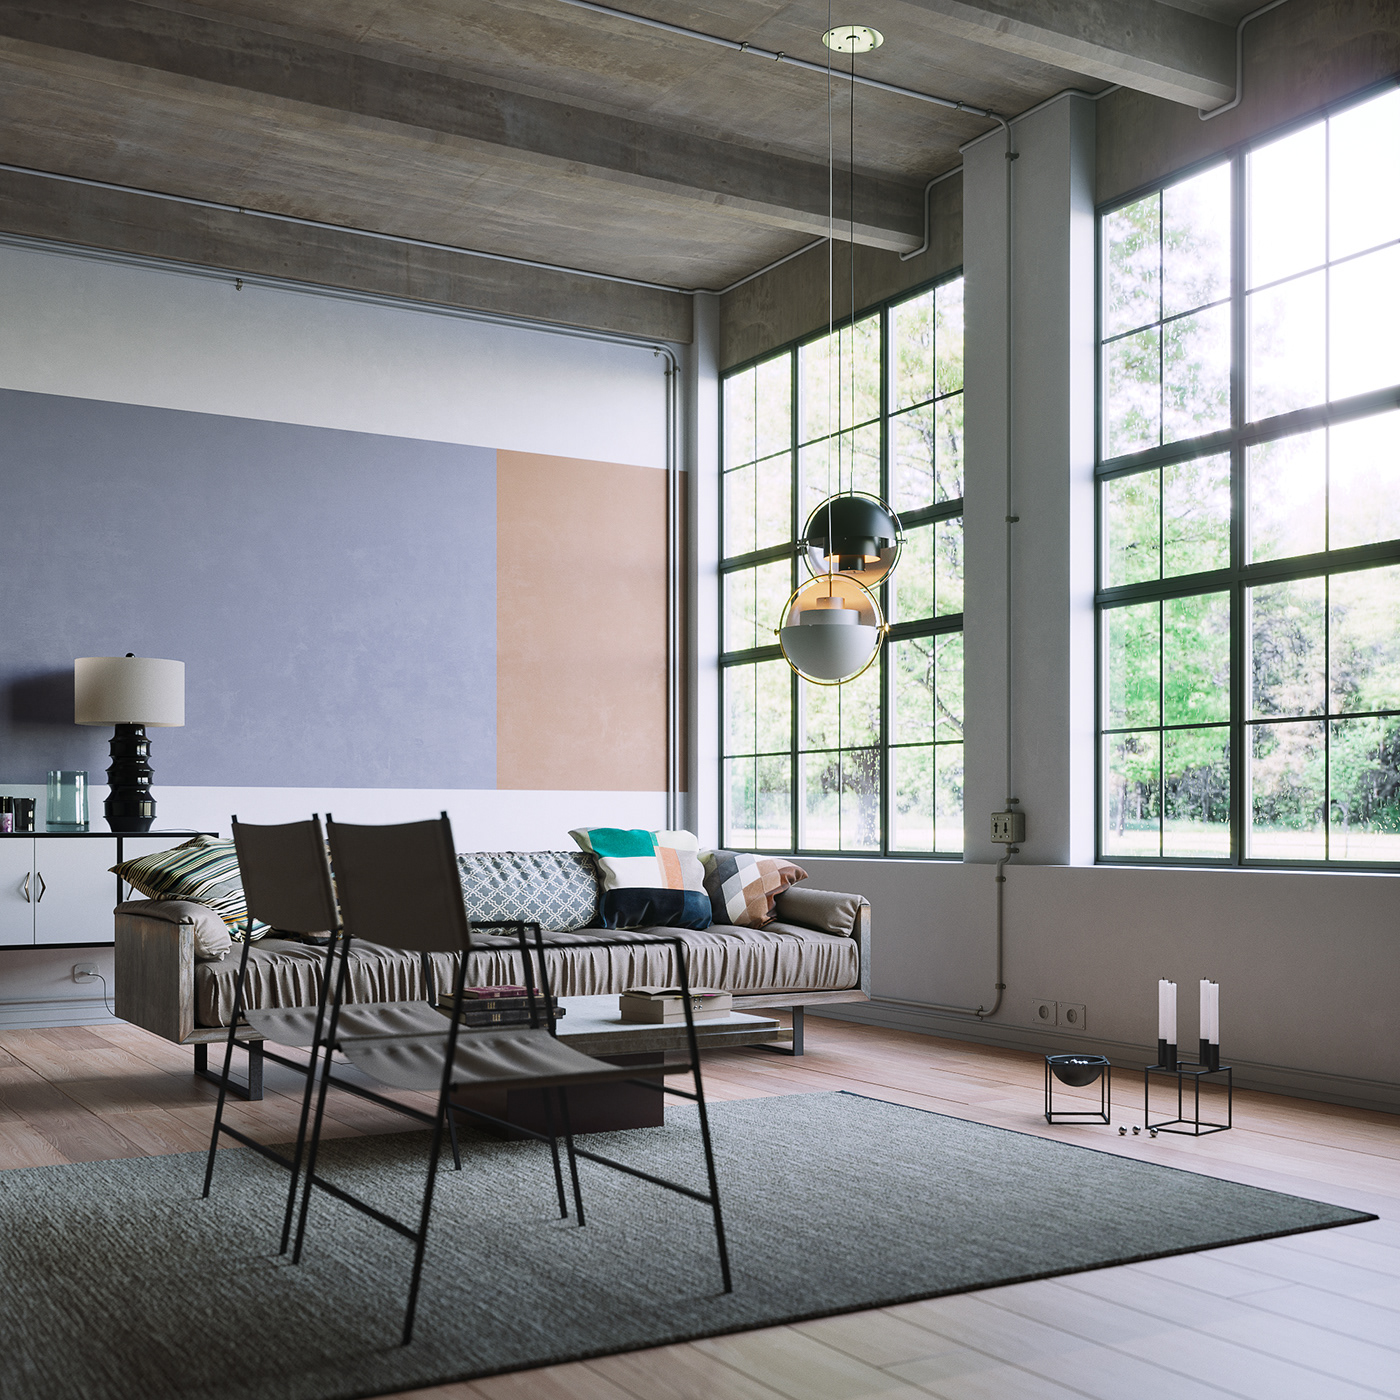 industrial LOFT cinema4d corona Render archviz Interior scene 3D